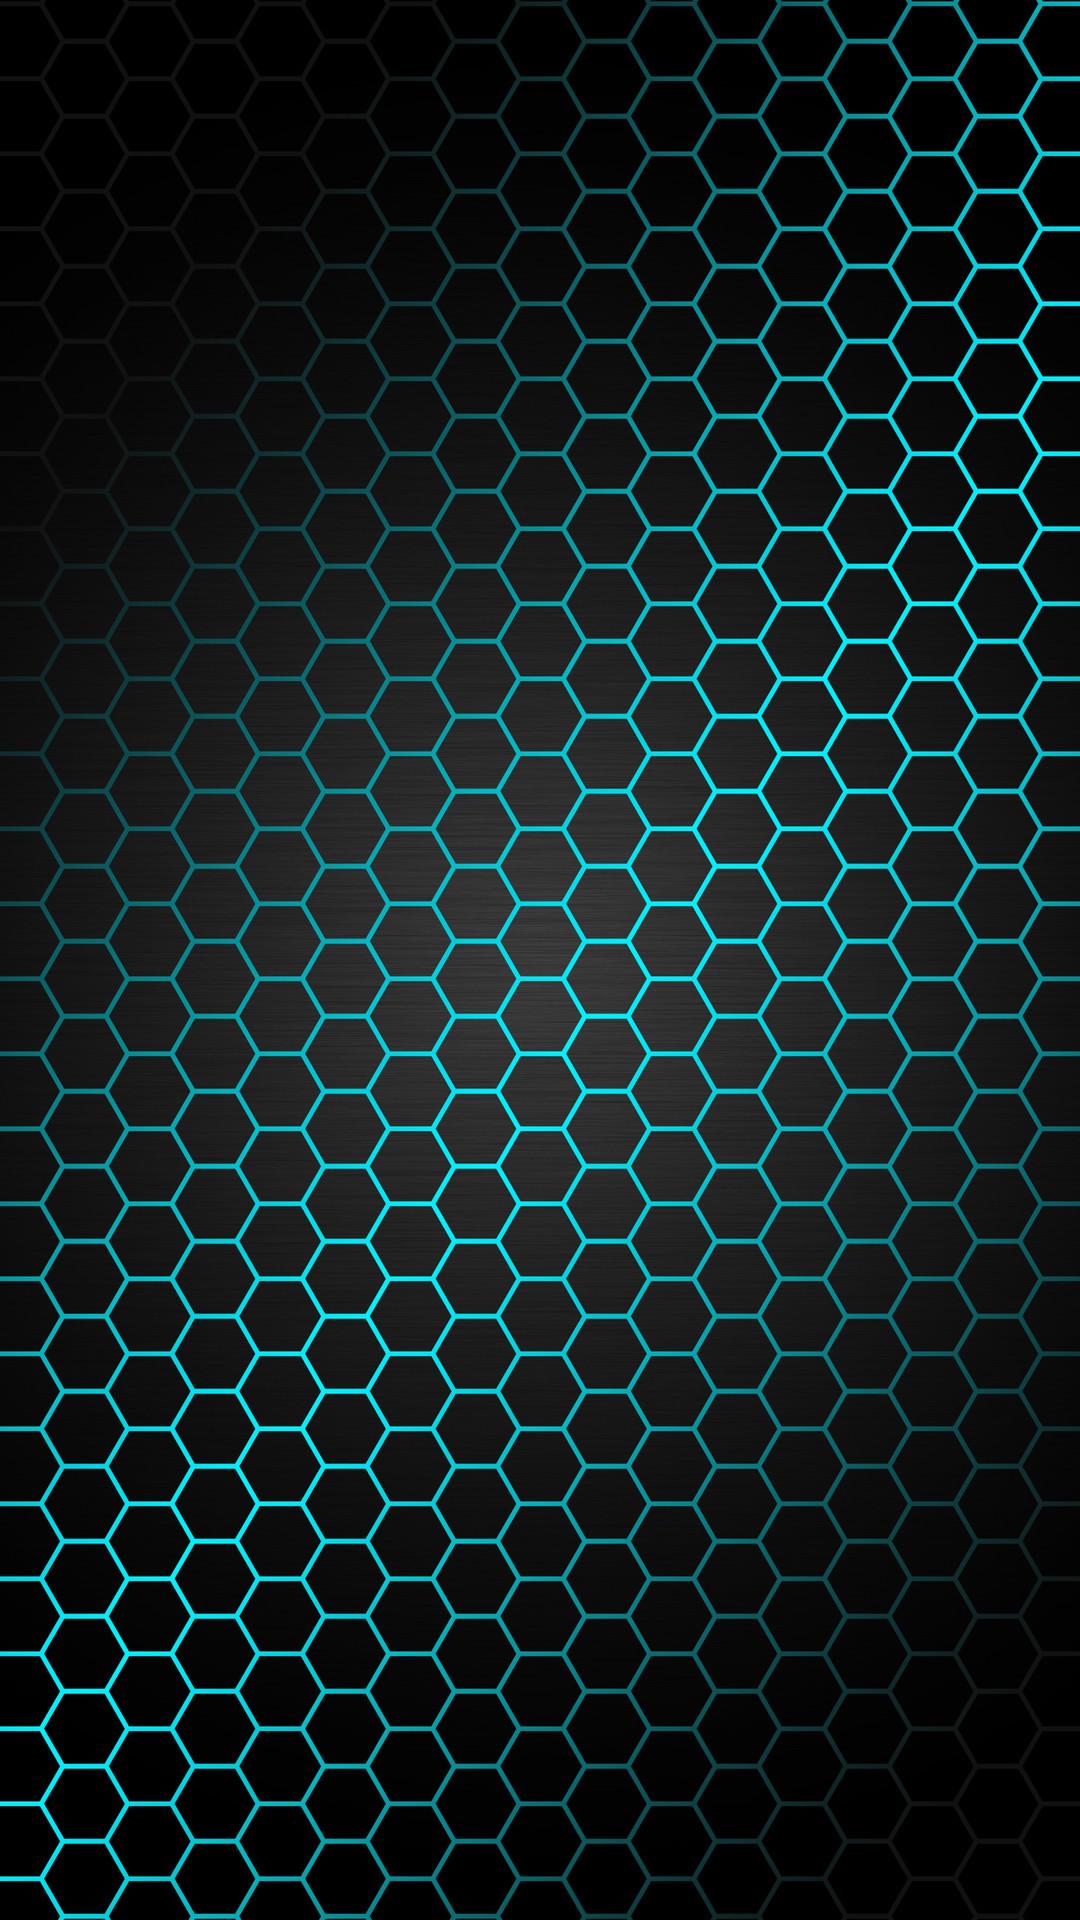 Res: 1080x1920, Blue Hexagon Pattern Wallpaper